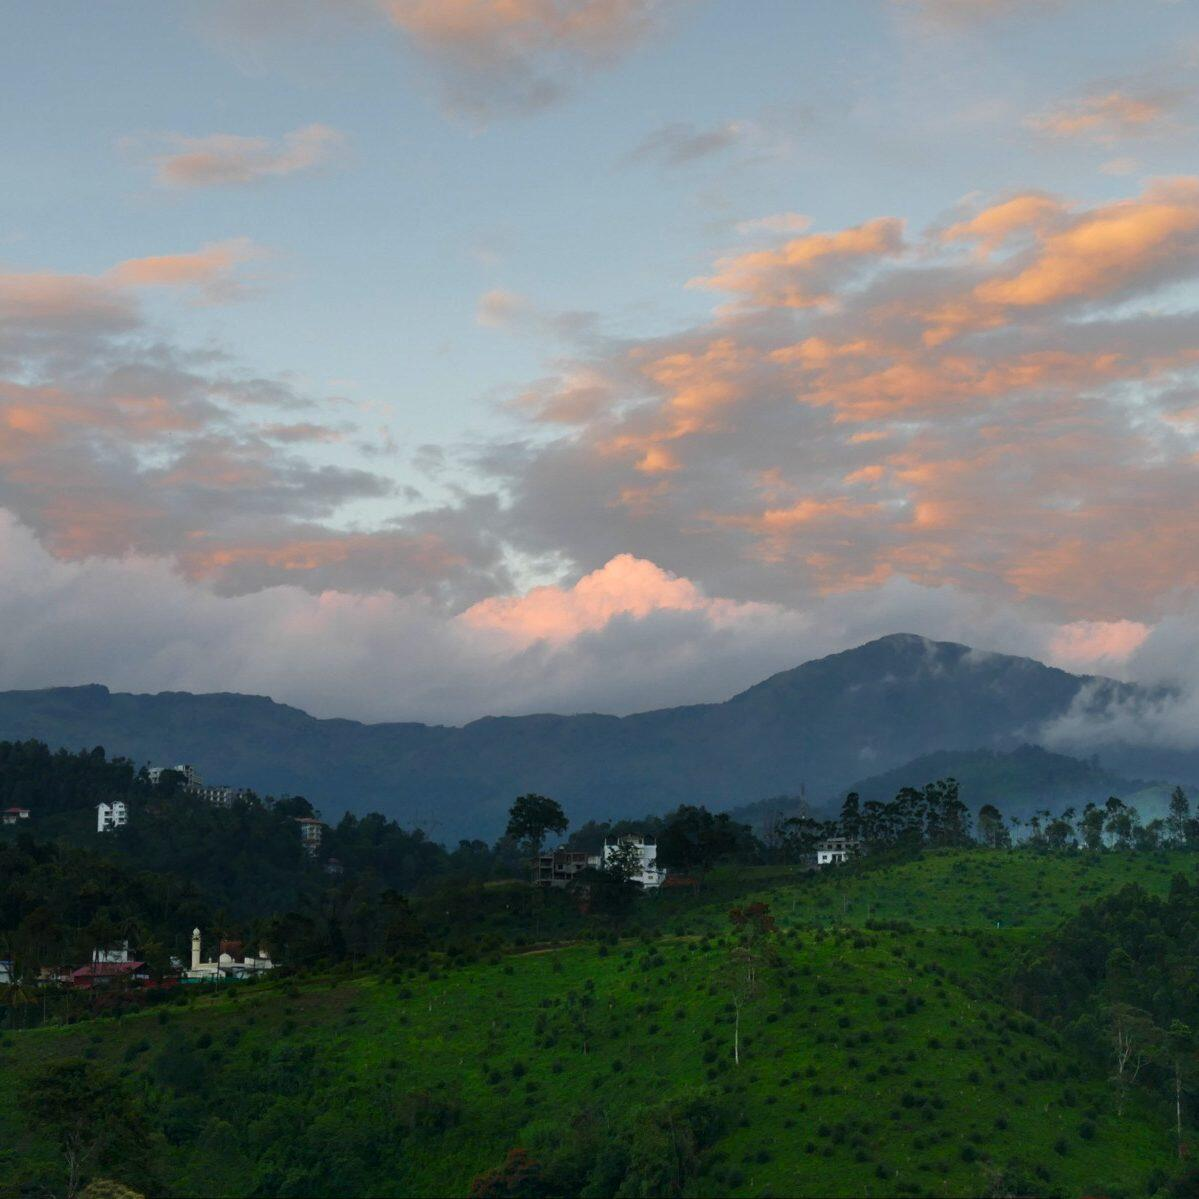 Sunset over the Western Ghats mountains. Noah Strycker